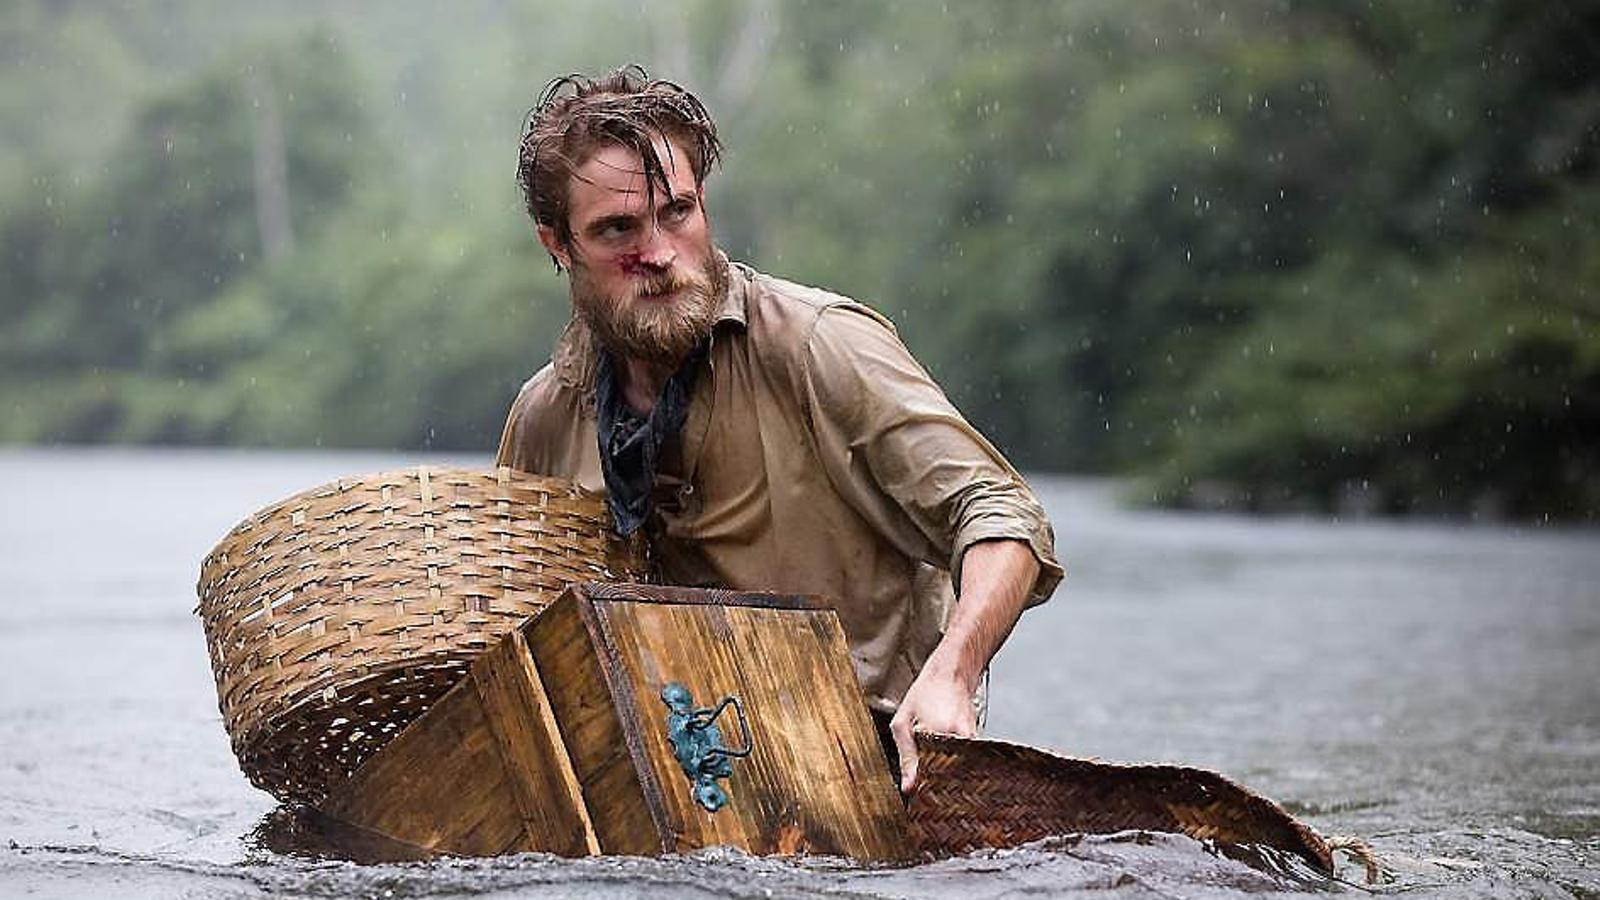 Robert Pattinson, musa del cine d'autor